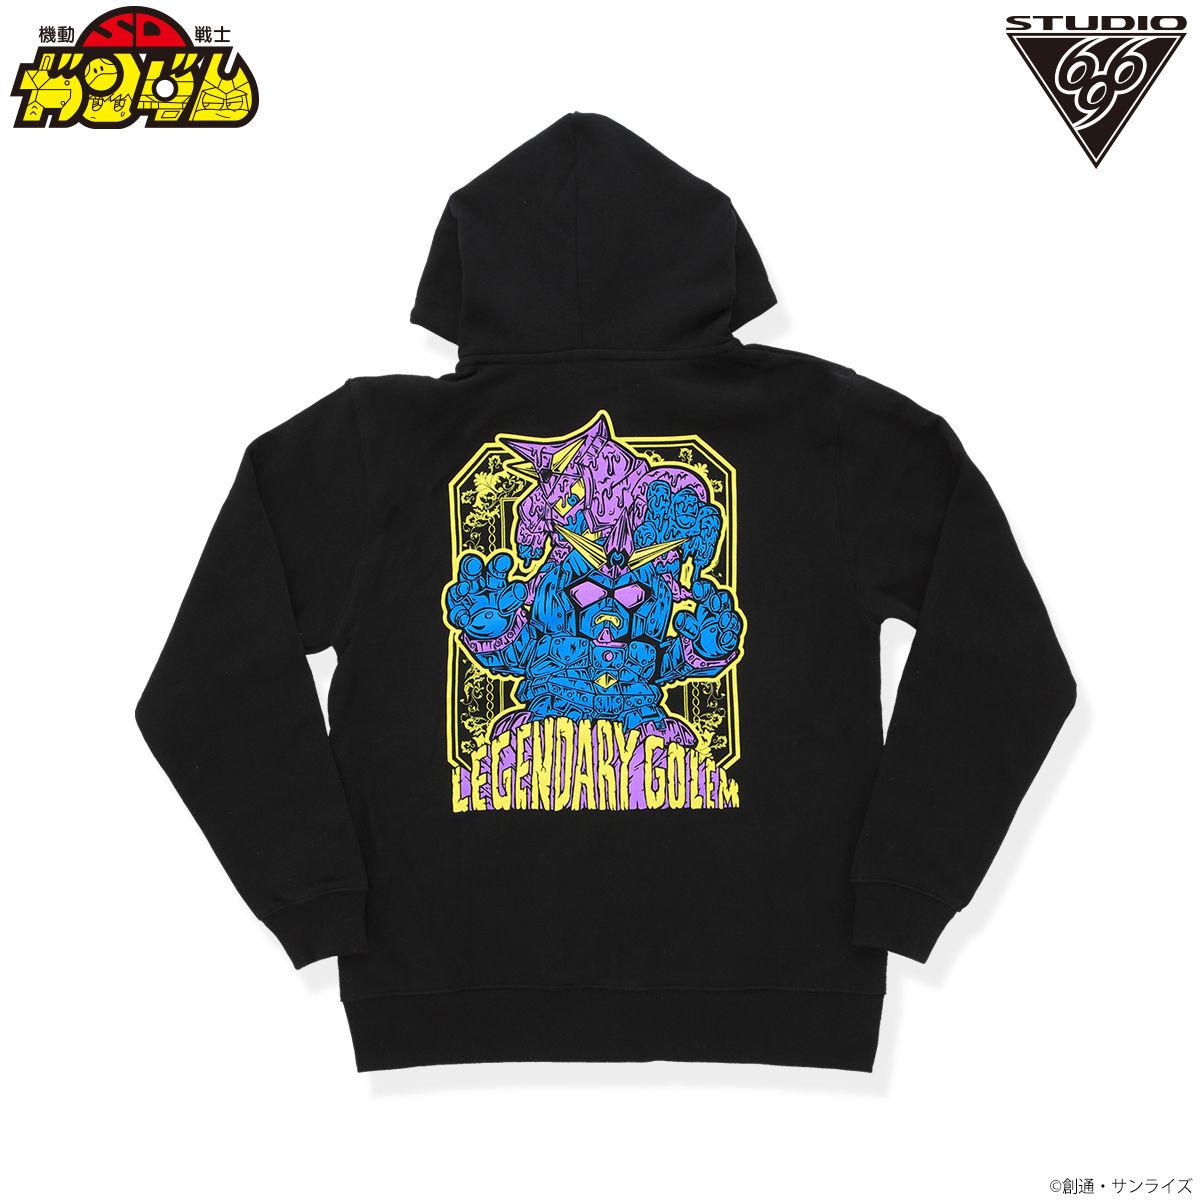 SD鋼彈 巨人重鋼彈魔像與泥塑巨人 帽T feat.STUDIO696